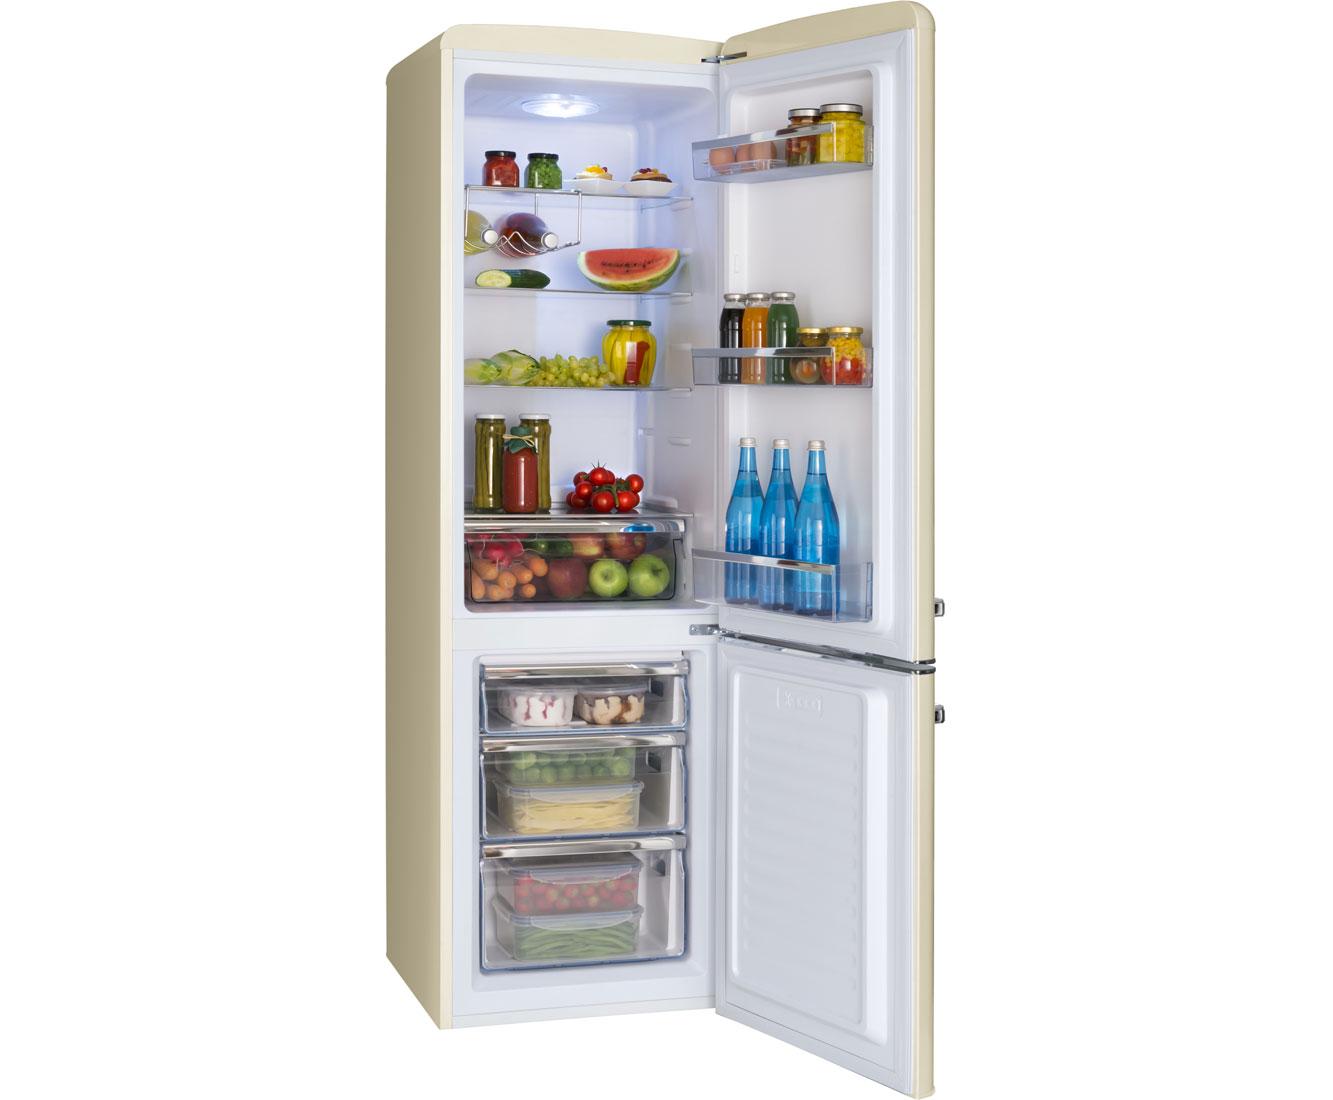 Amica Retro Kühlschrank Hellblau : Amica kgcr l kühl gefrierkombination er breite